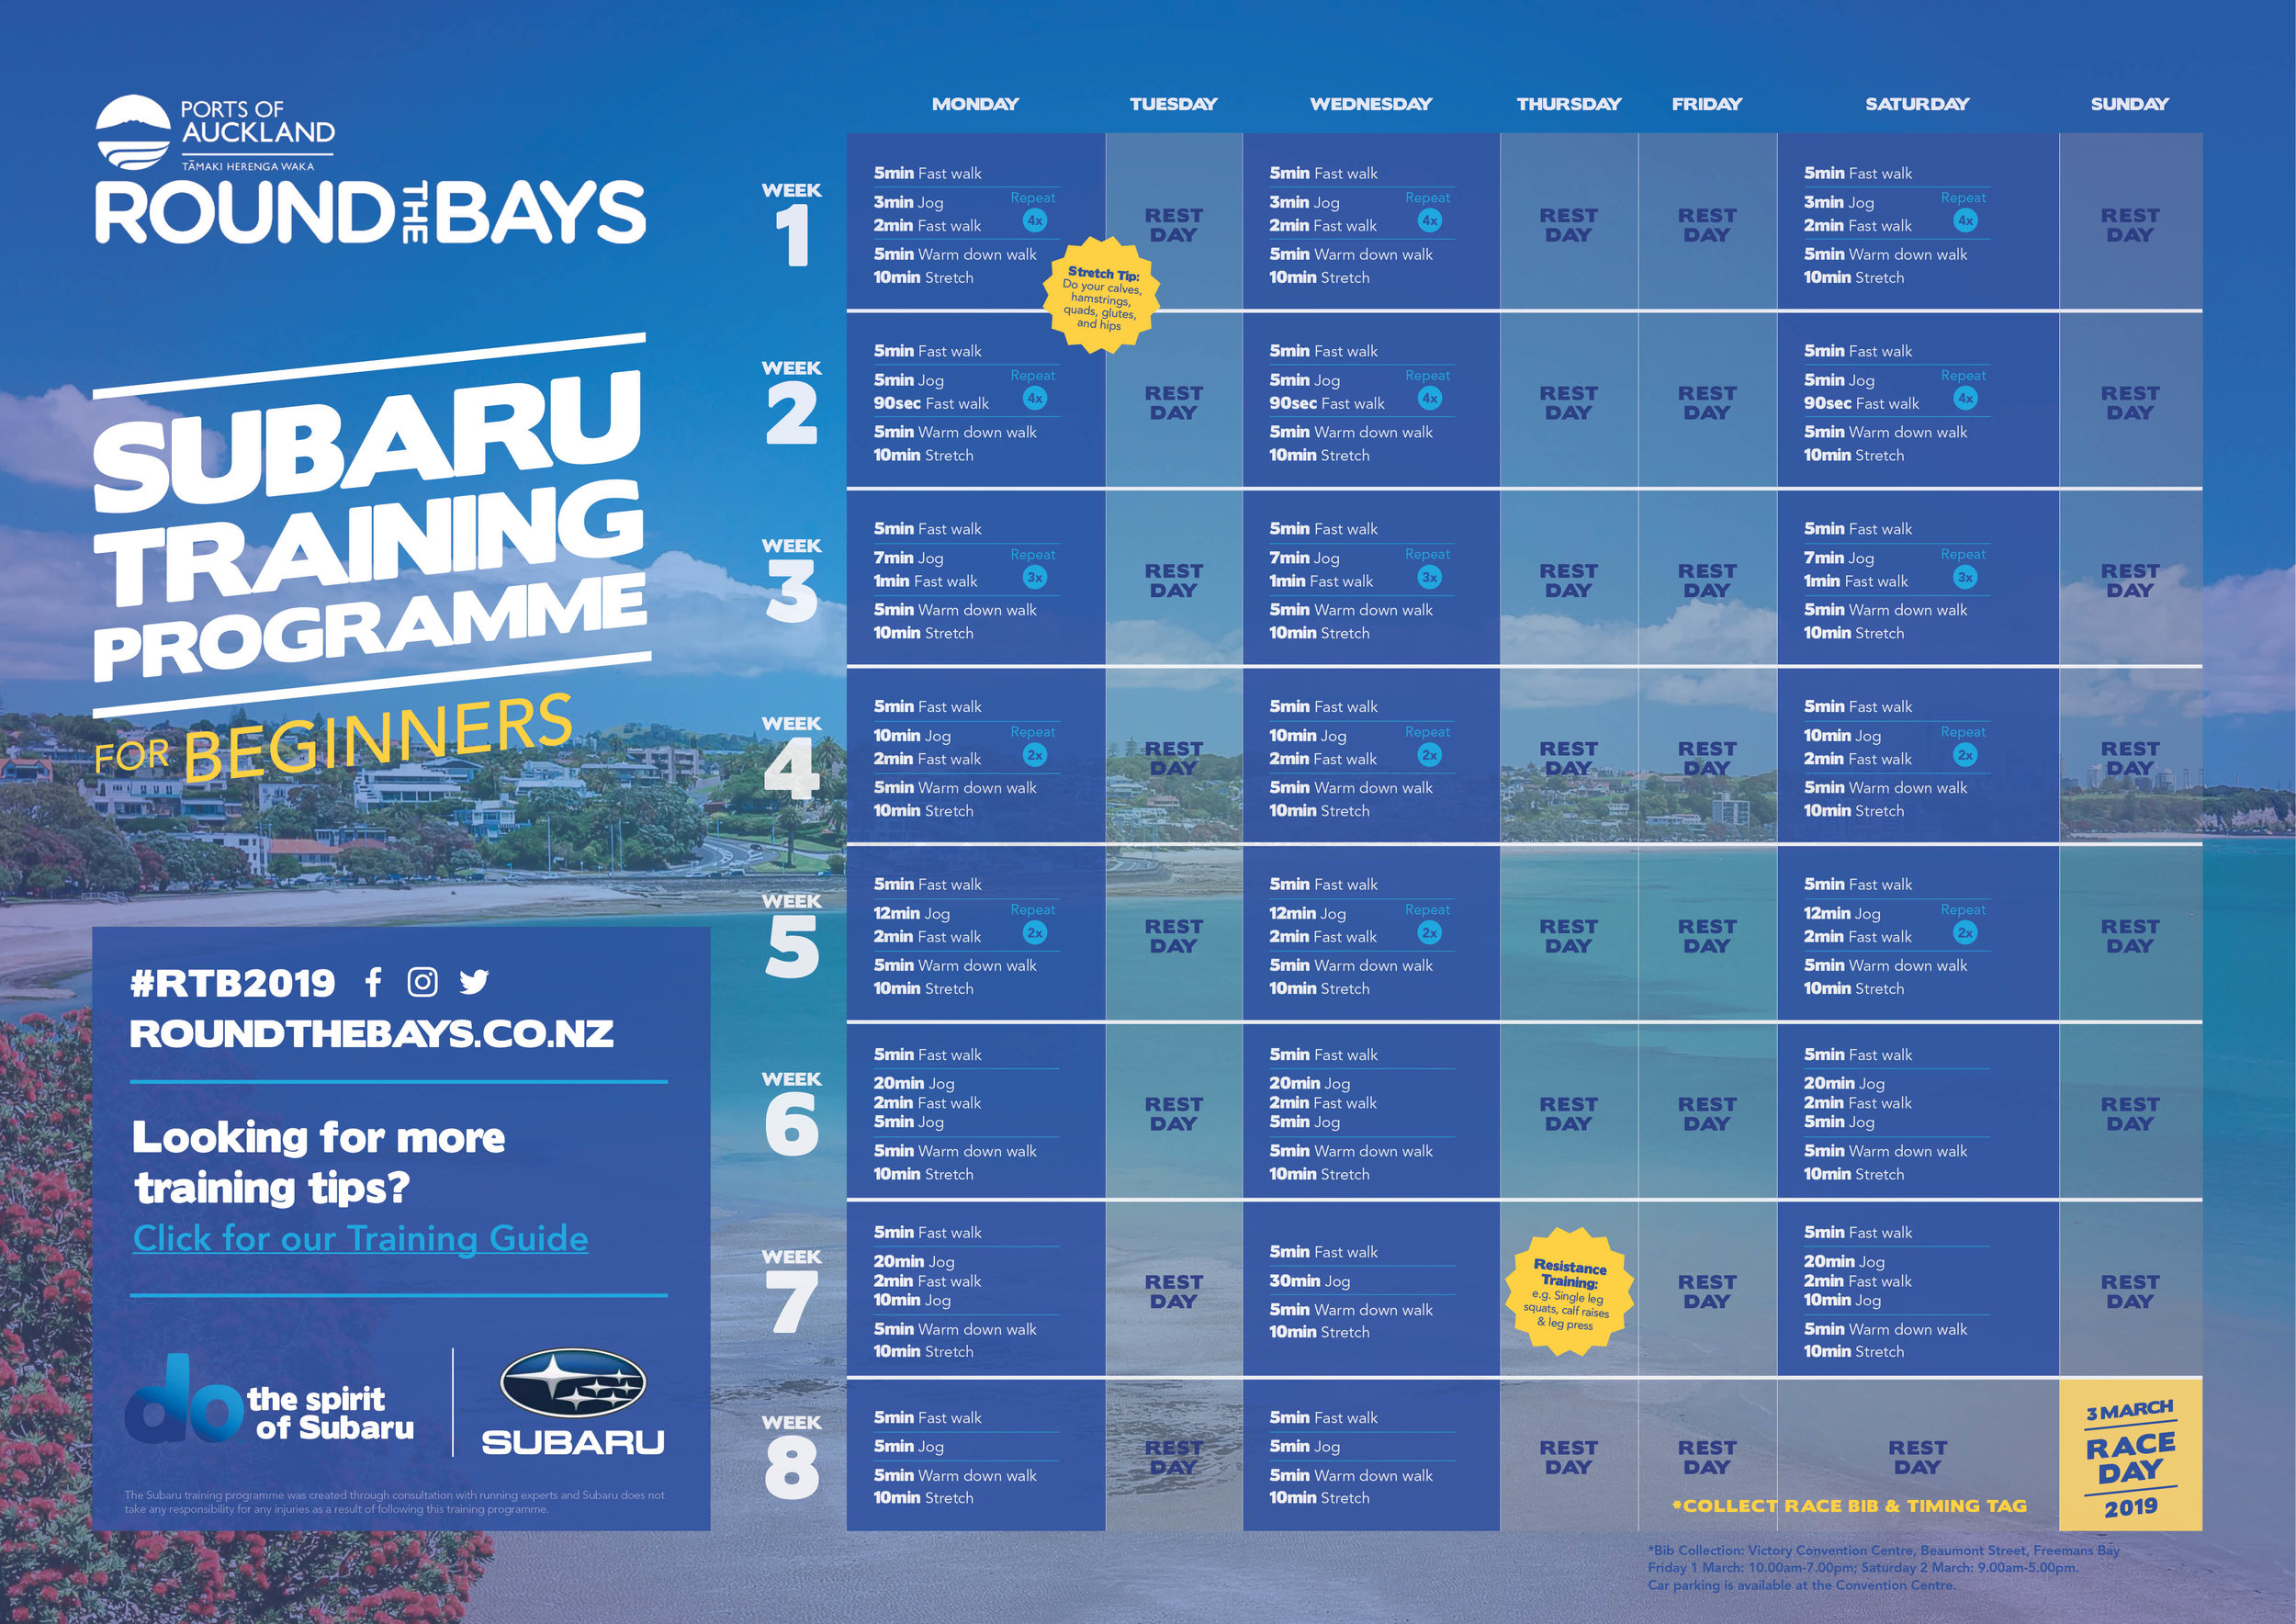 Subaru Training Programme for Beginners_RTB2019.jpg